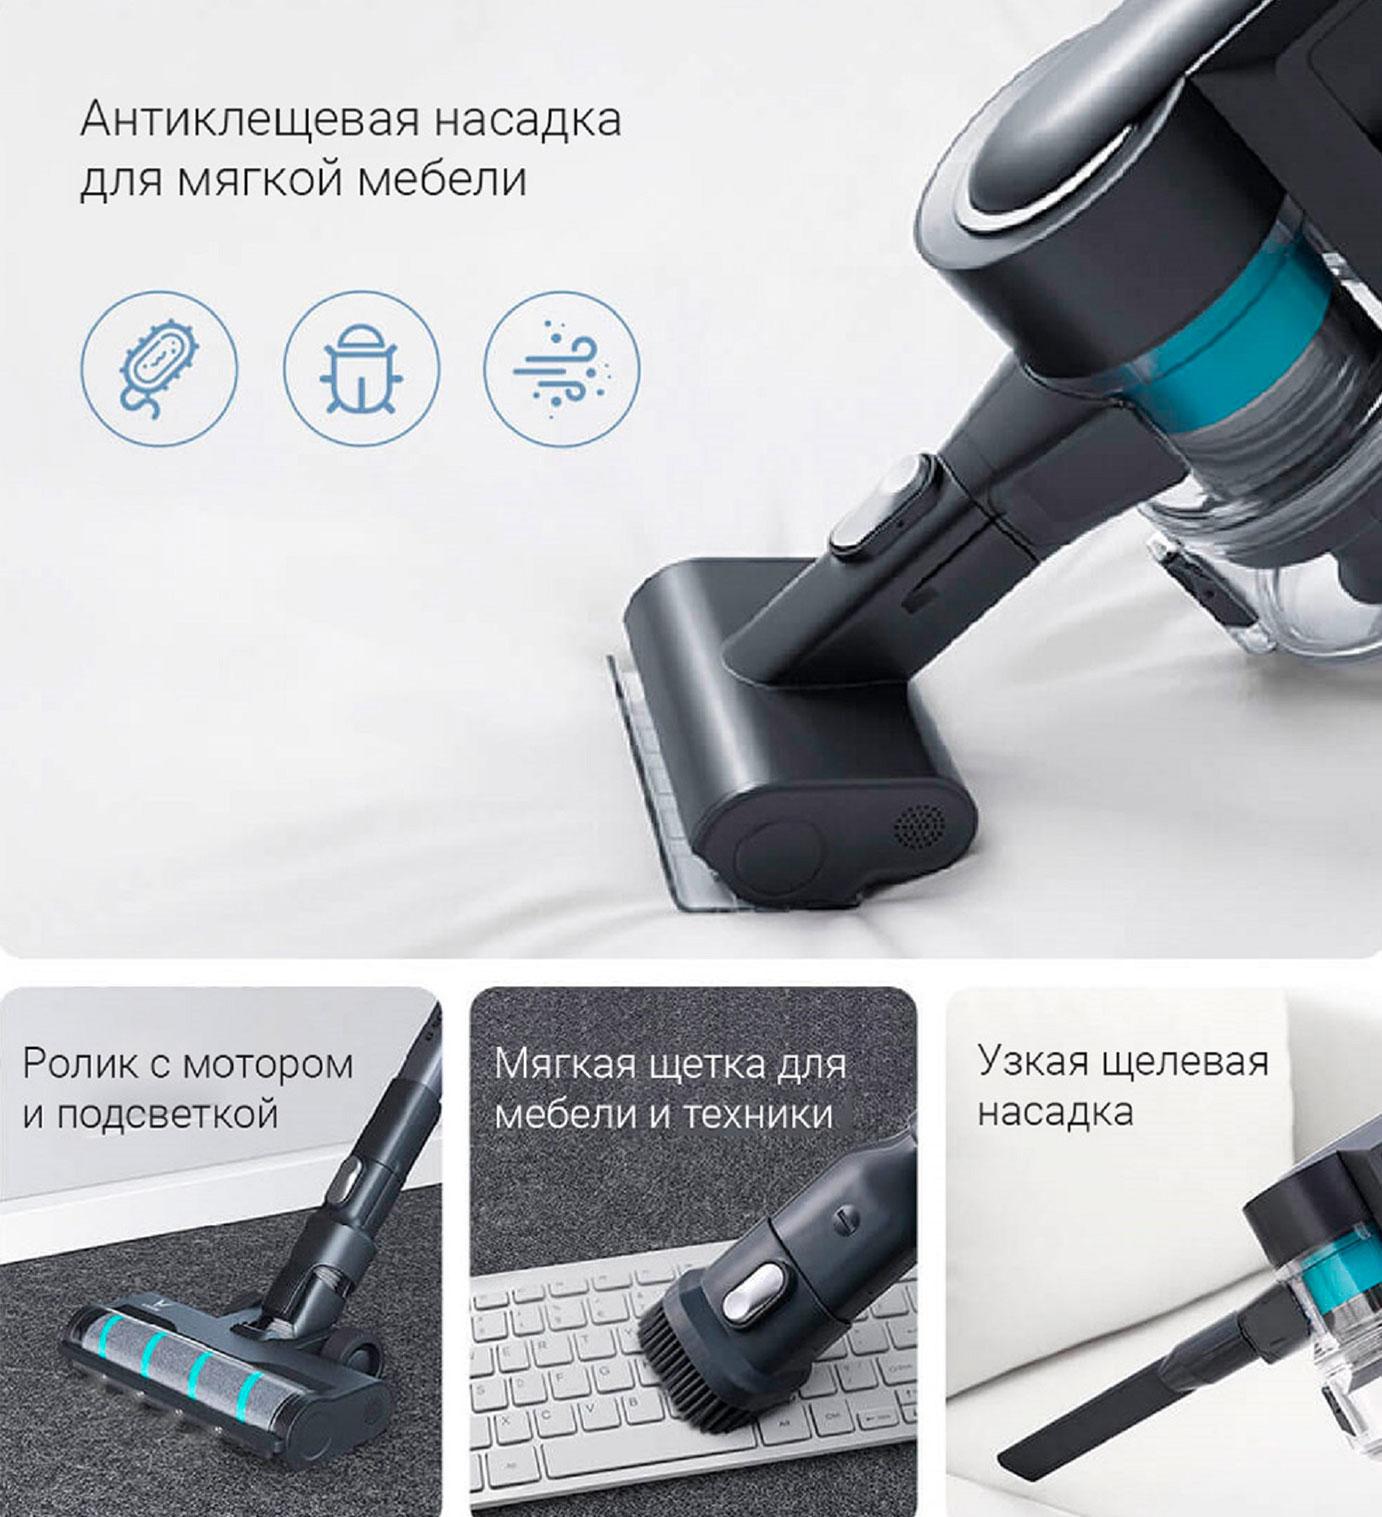 Opisanie Besprovodnoj Ruchnoj Pylesos Viomi A9 Hanheld Wireless Vacuum Cleaner Black 3